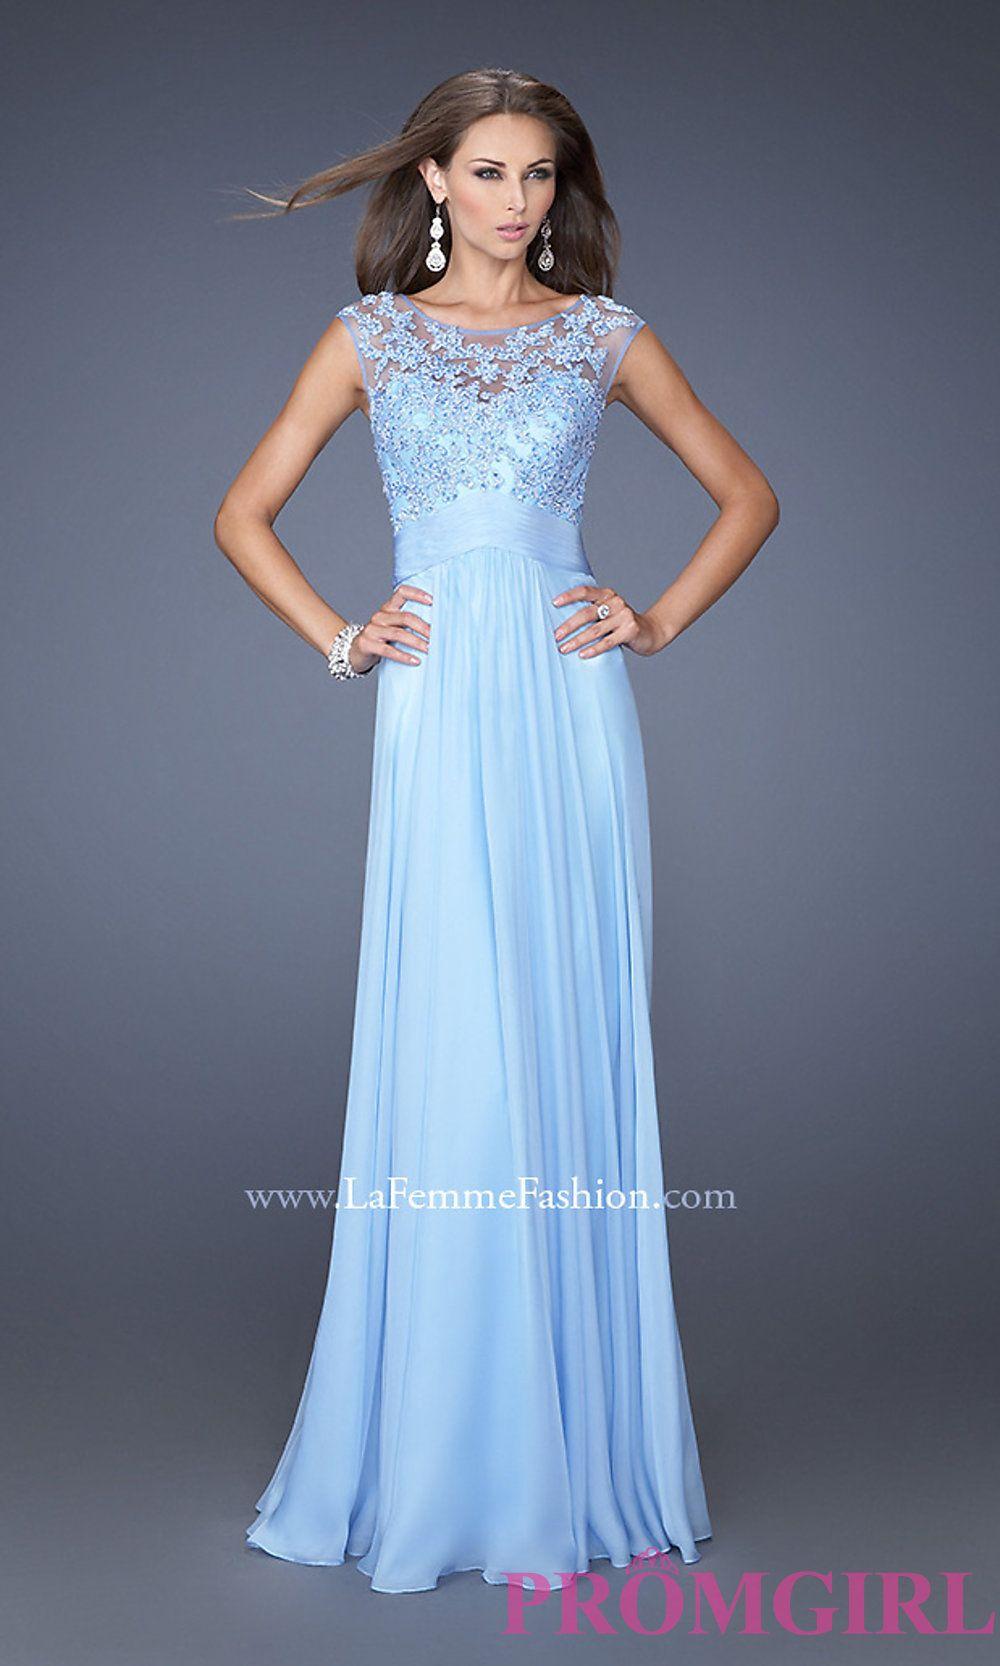 High Neck Long Blue Prom Dresses, La Femme Blue Gowns - PromGirl ...